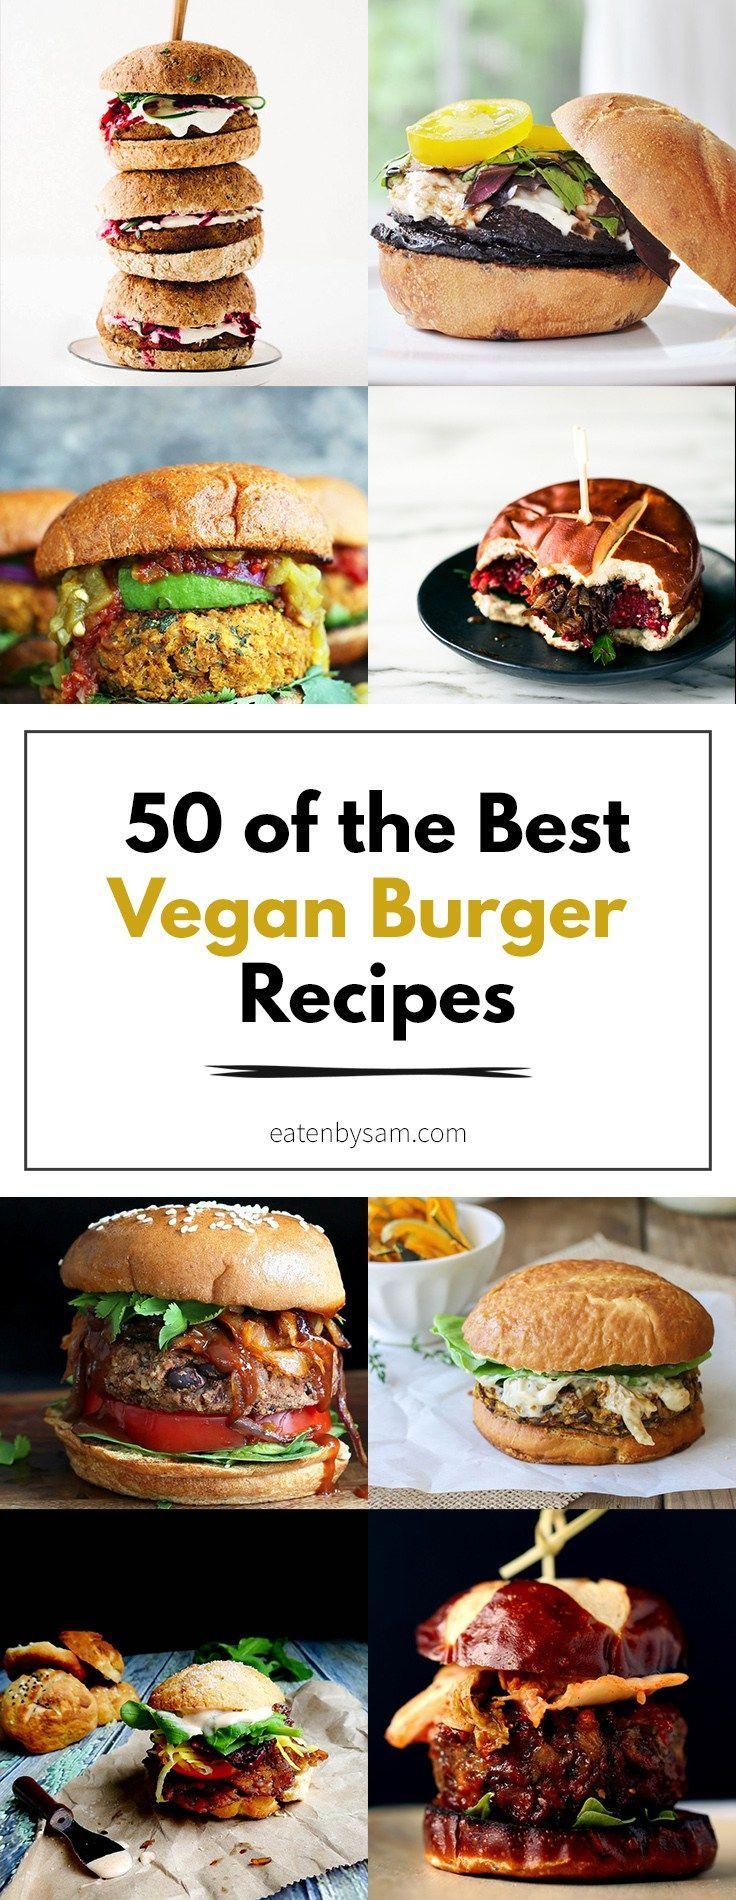 50 of the Best Vegan Burger Recipes